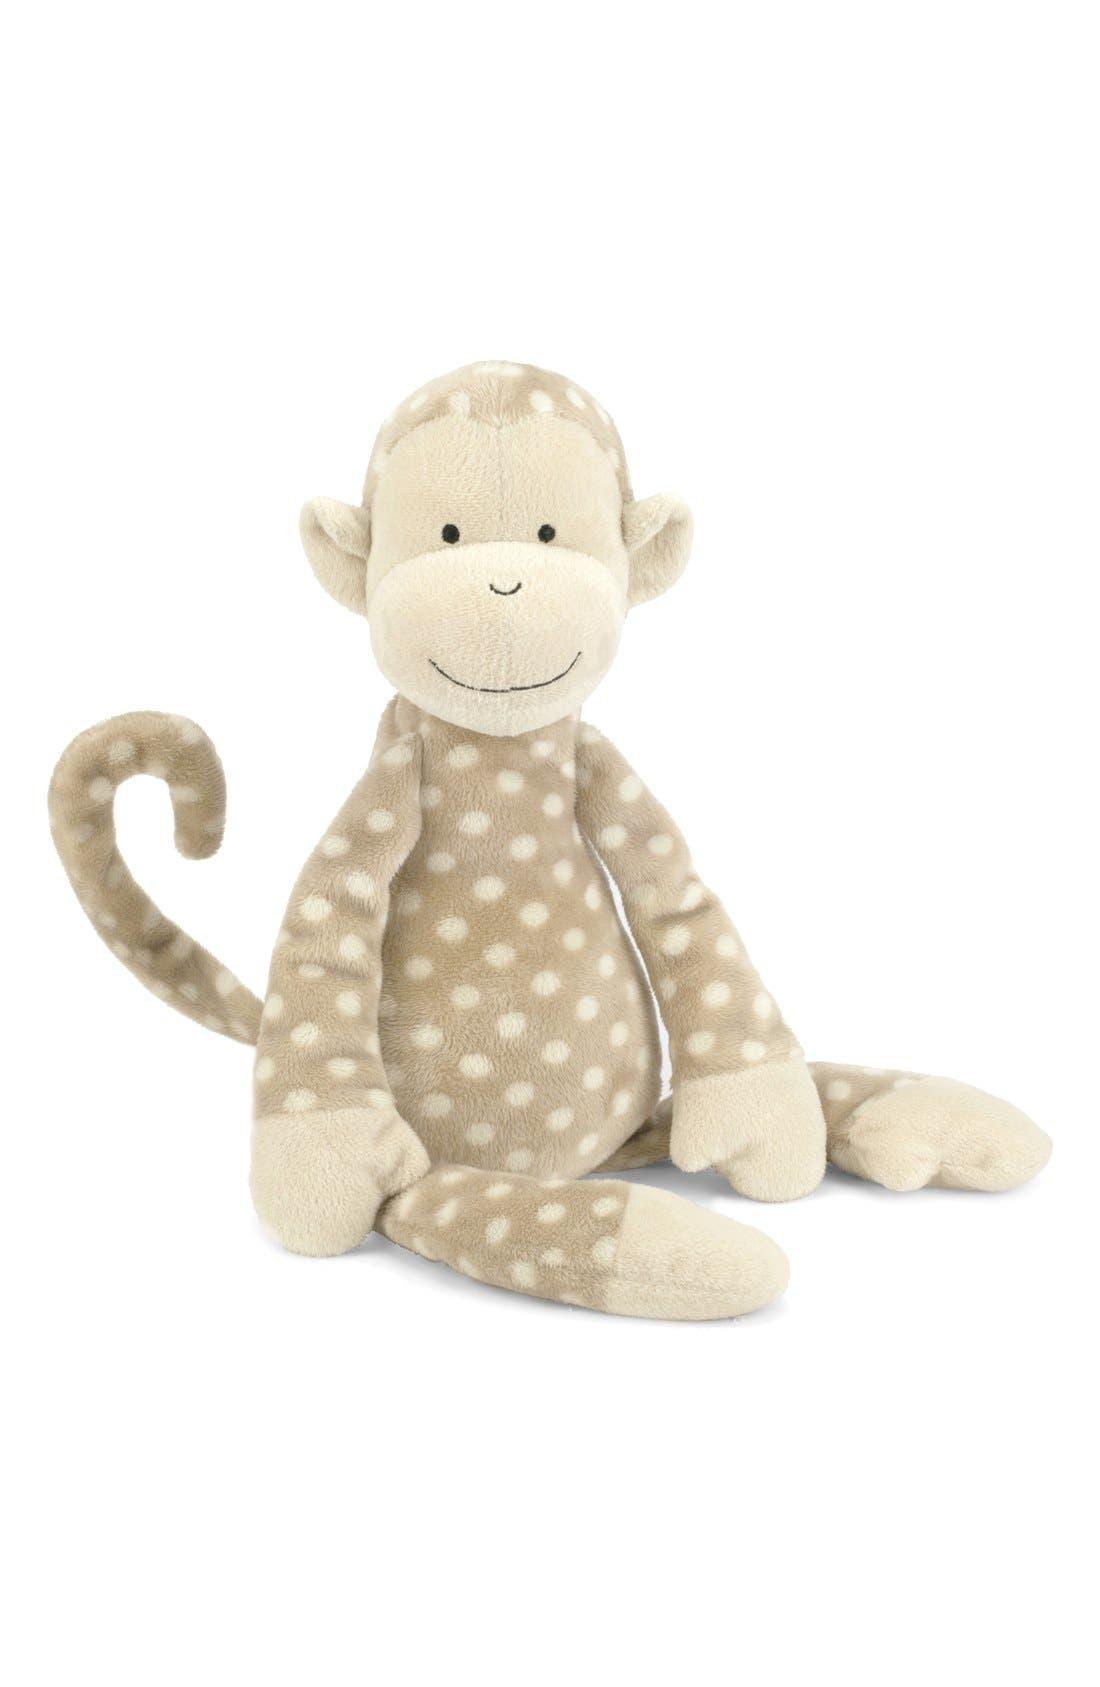 Jellycat 'Monty Monkey' Stuffed Animal